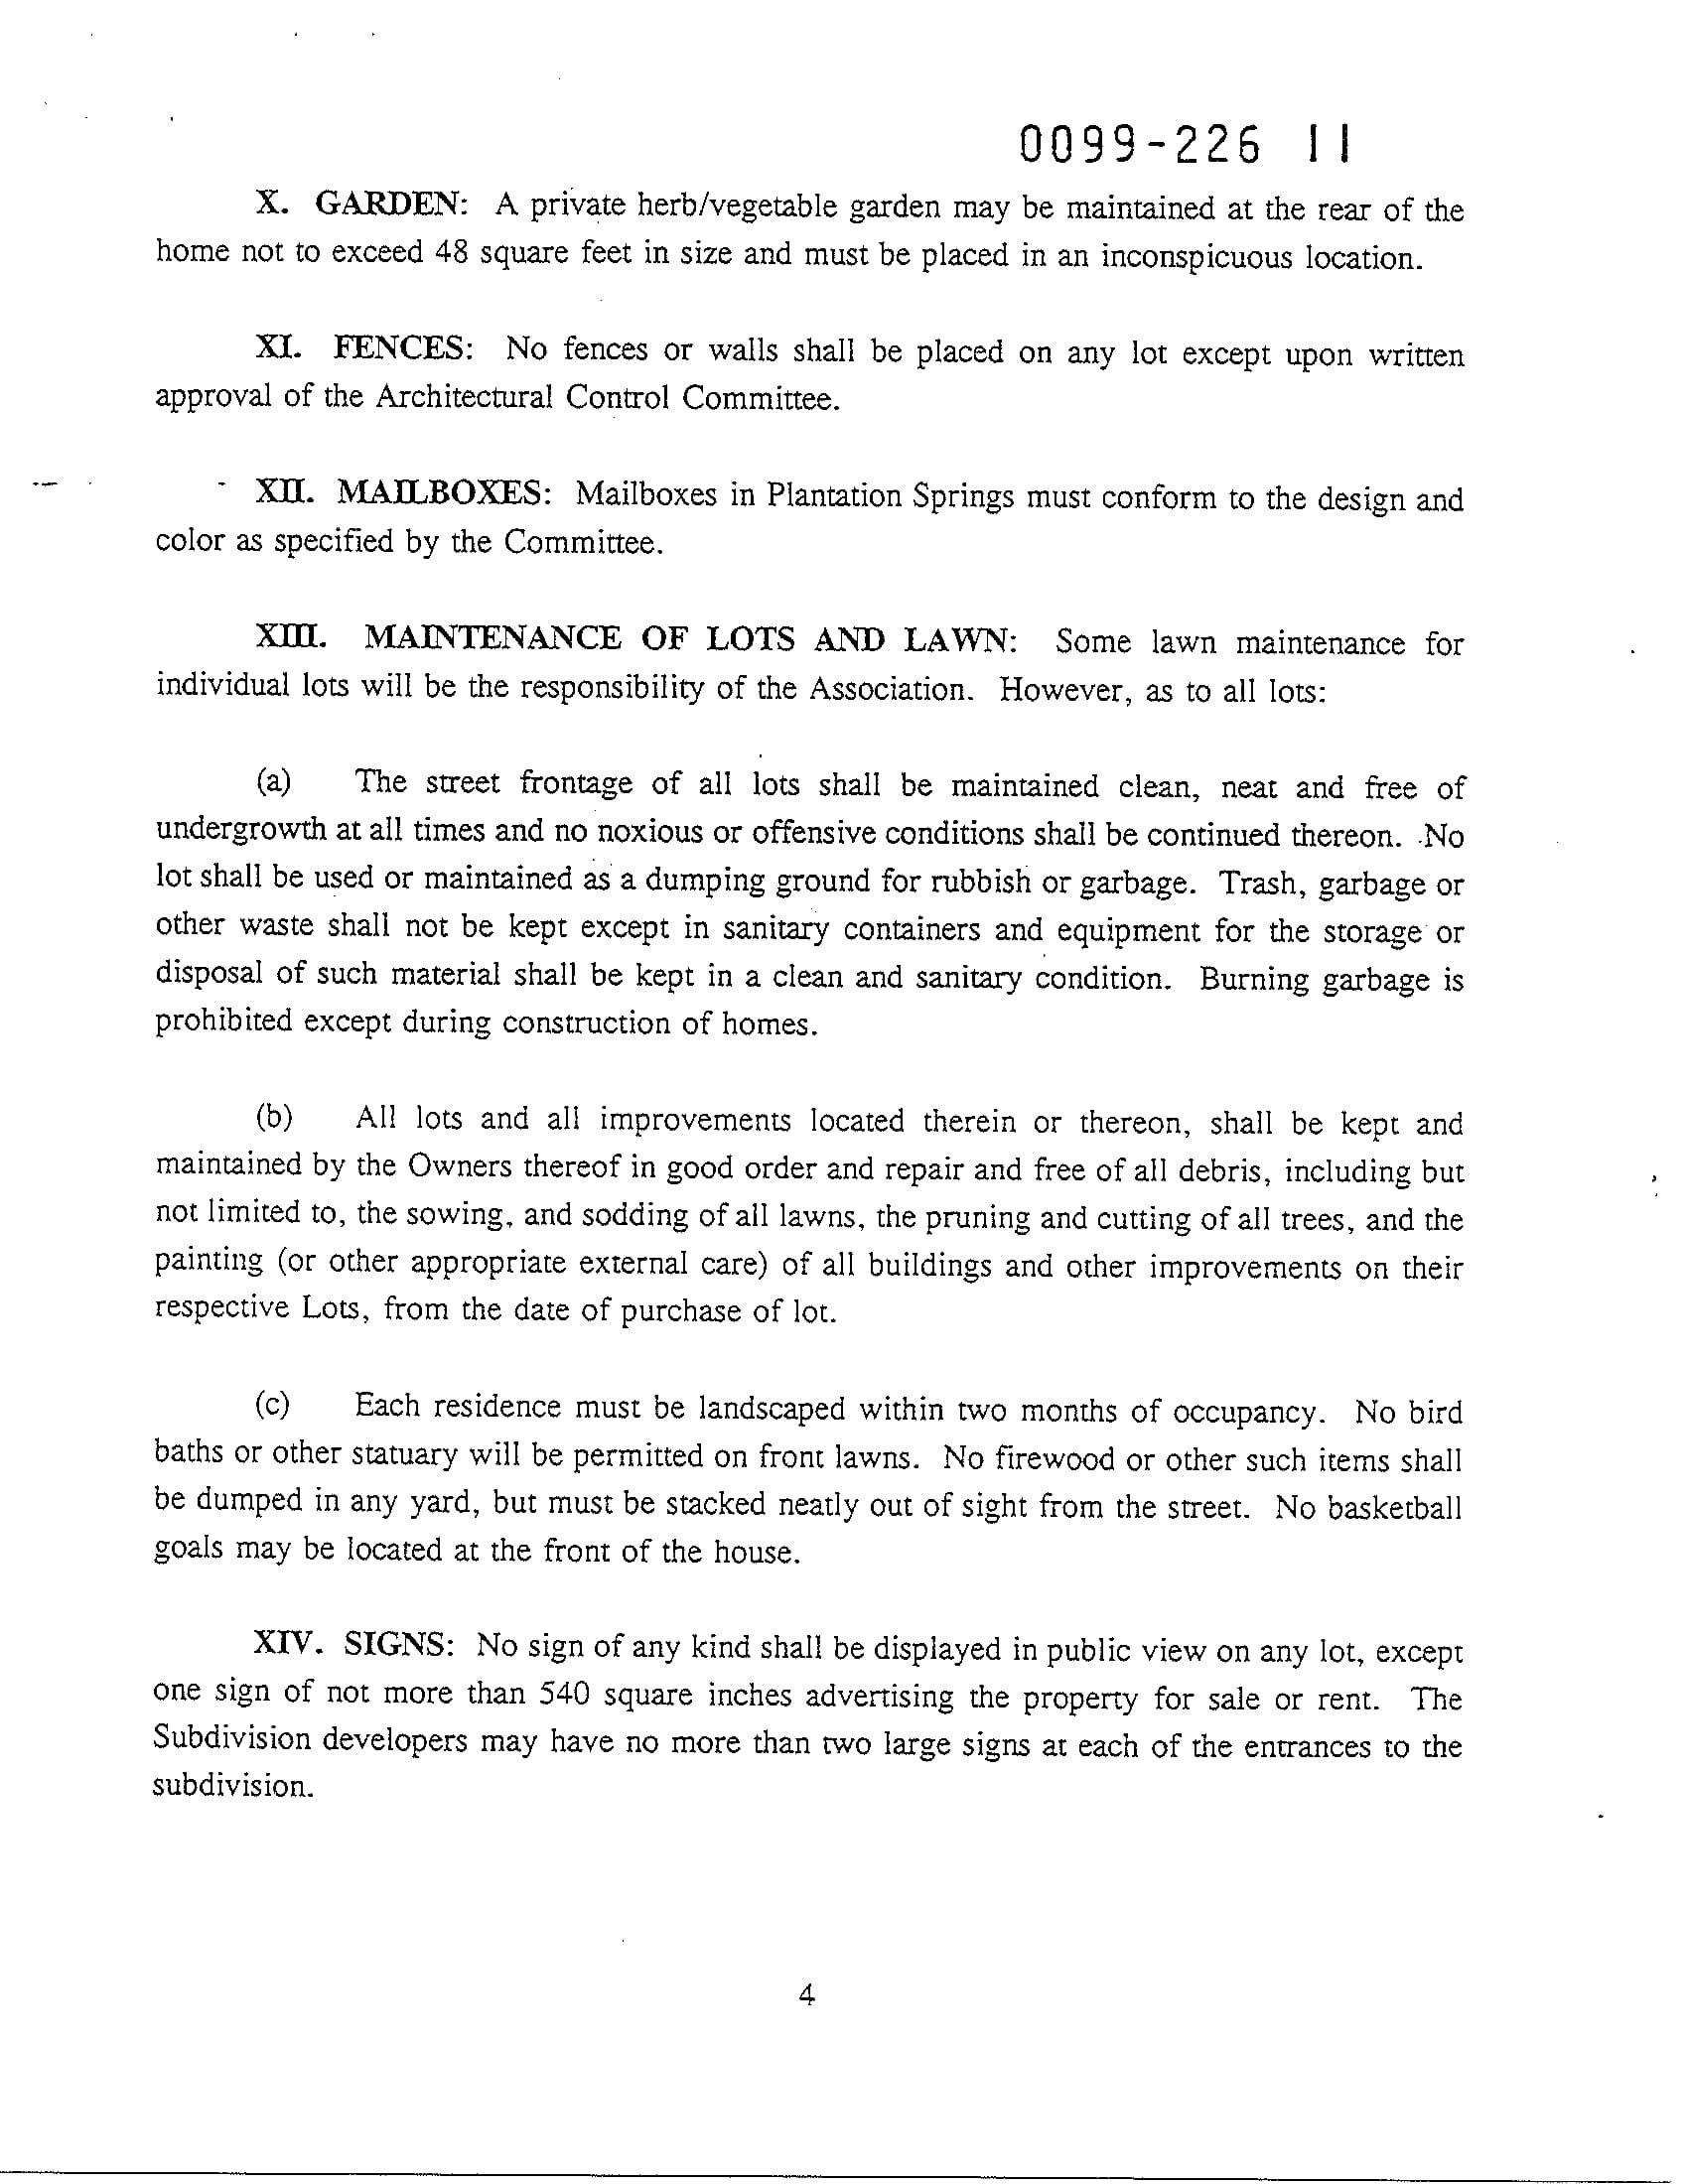 plantation springs-phase 1-covenants-4.jpg